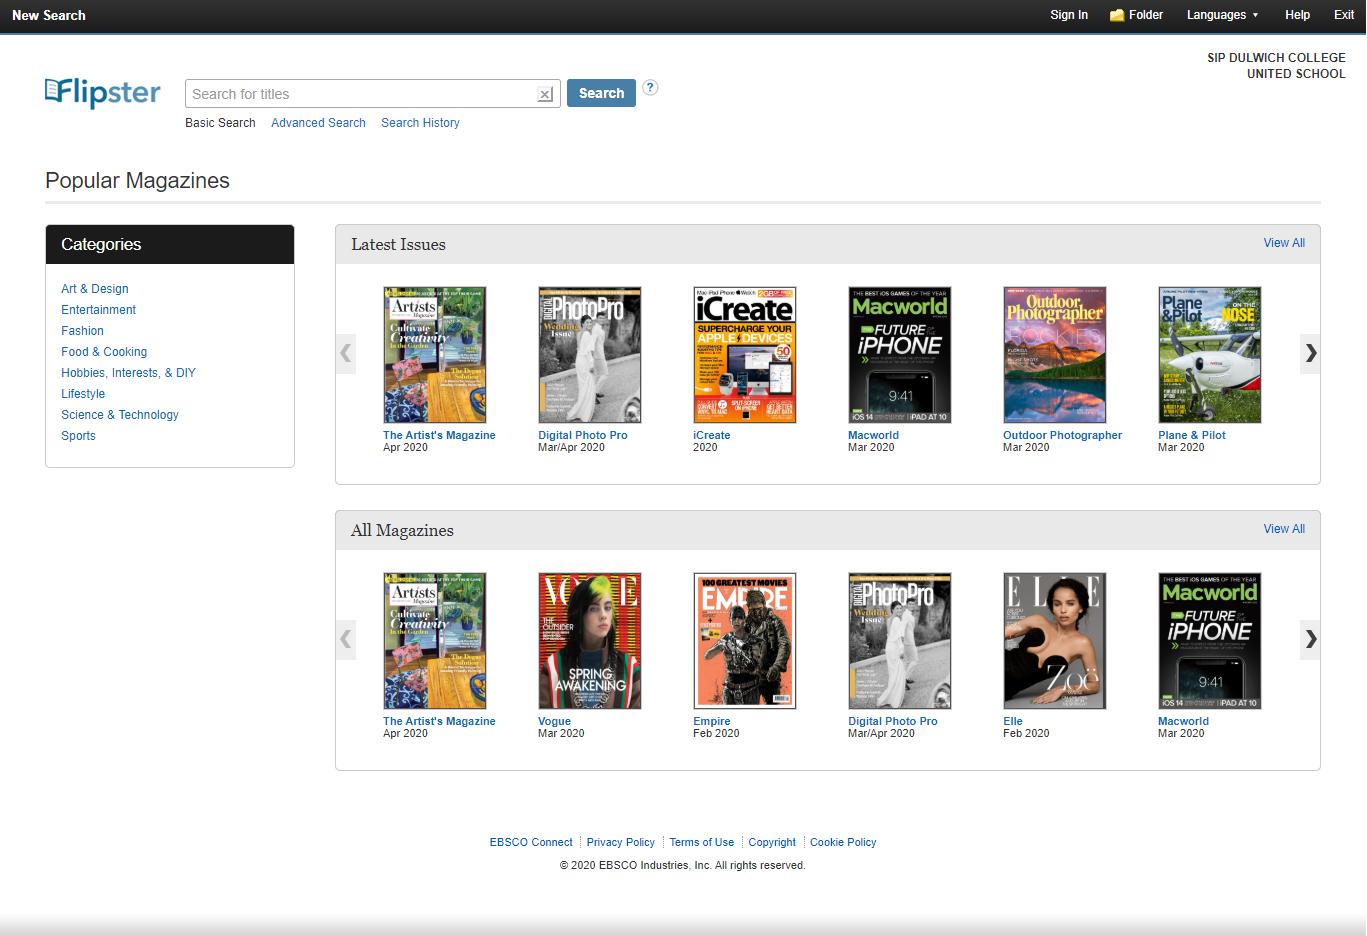 screencapture-web-a-ebscohost-eon-search-basic-2020-02-14-09-09-20